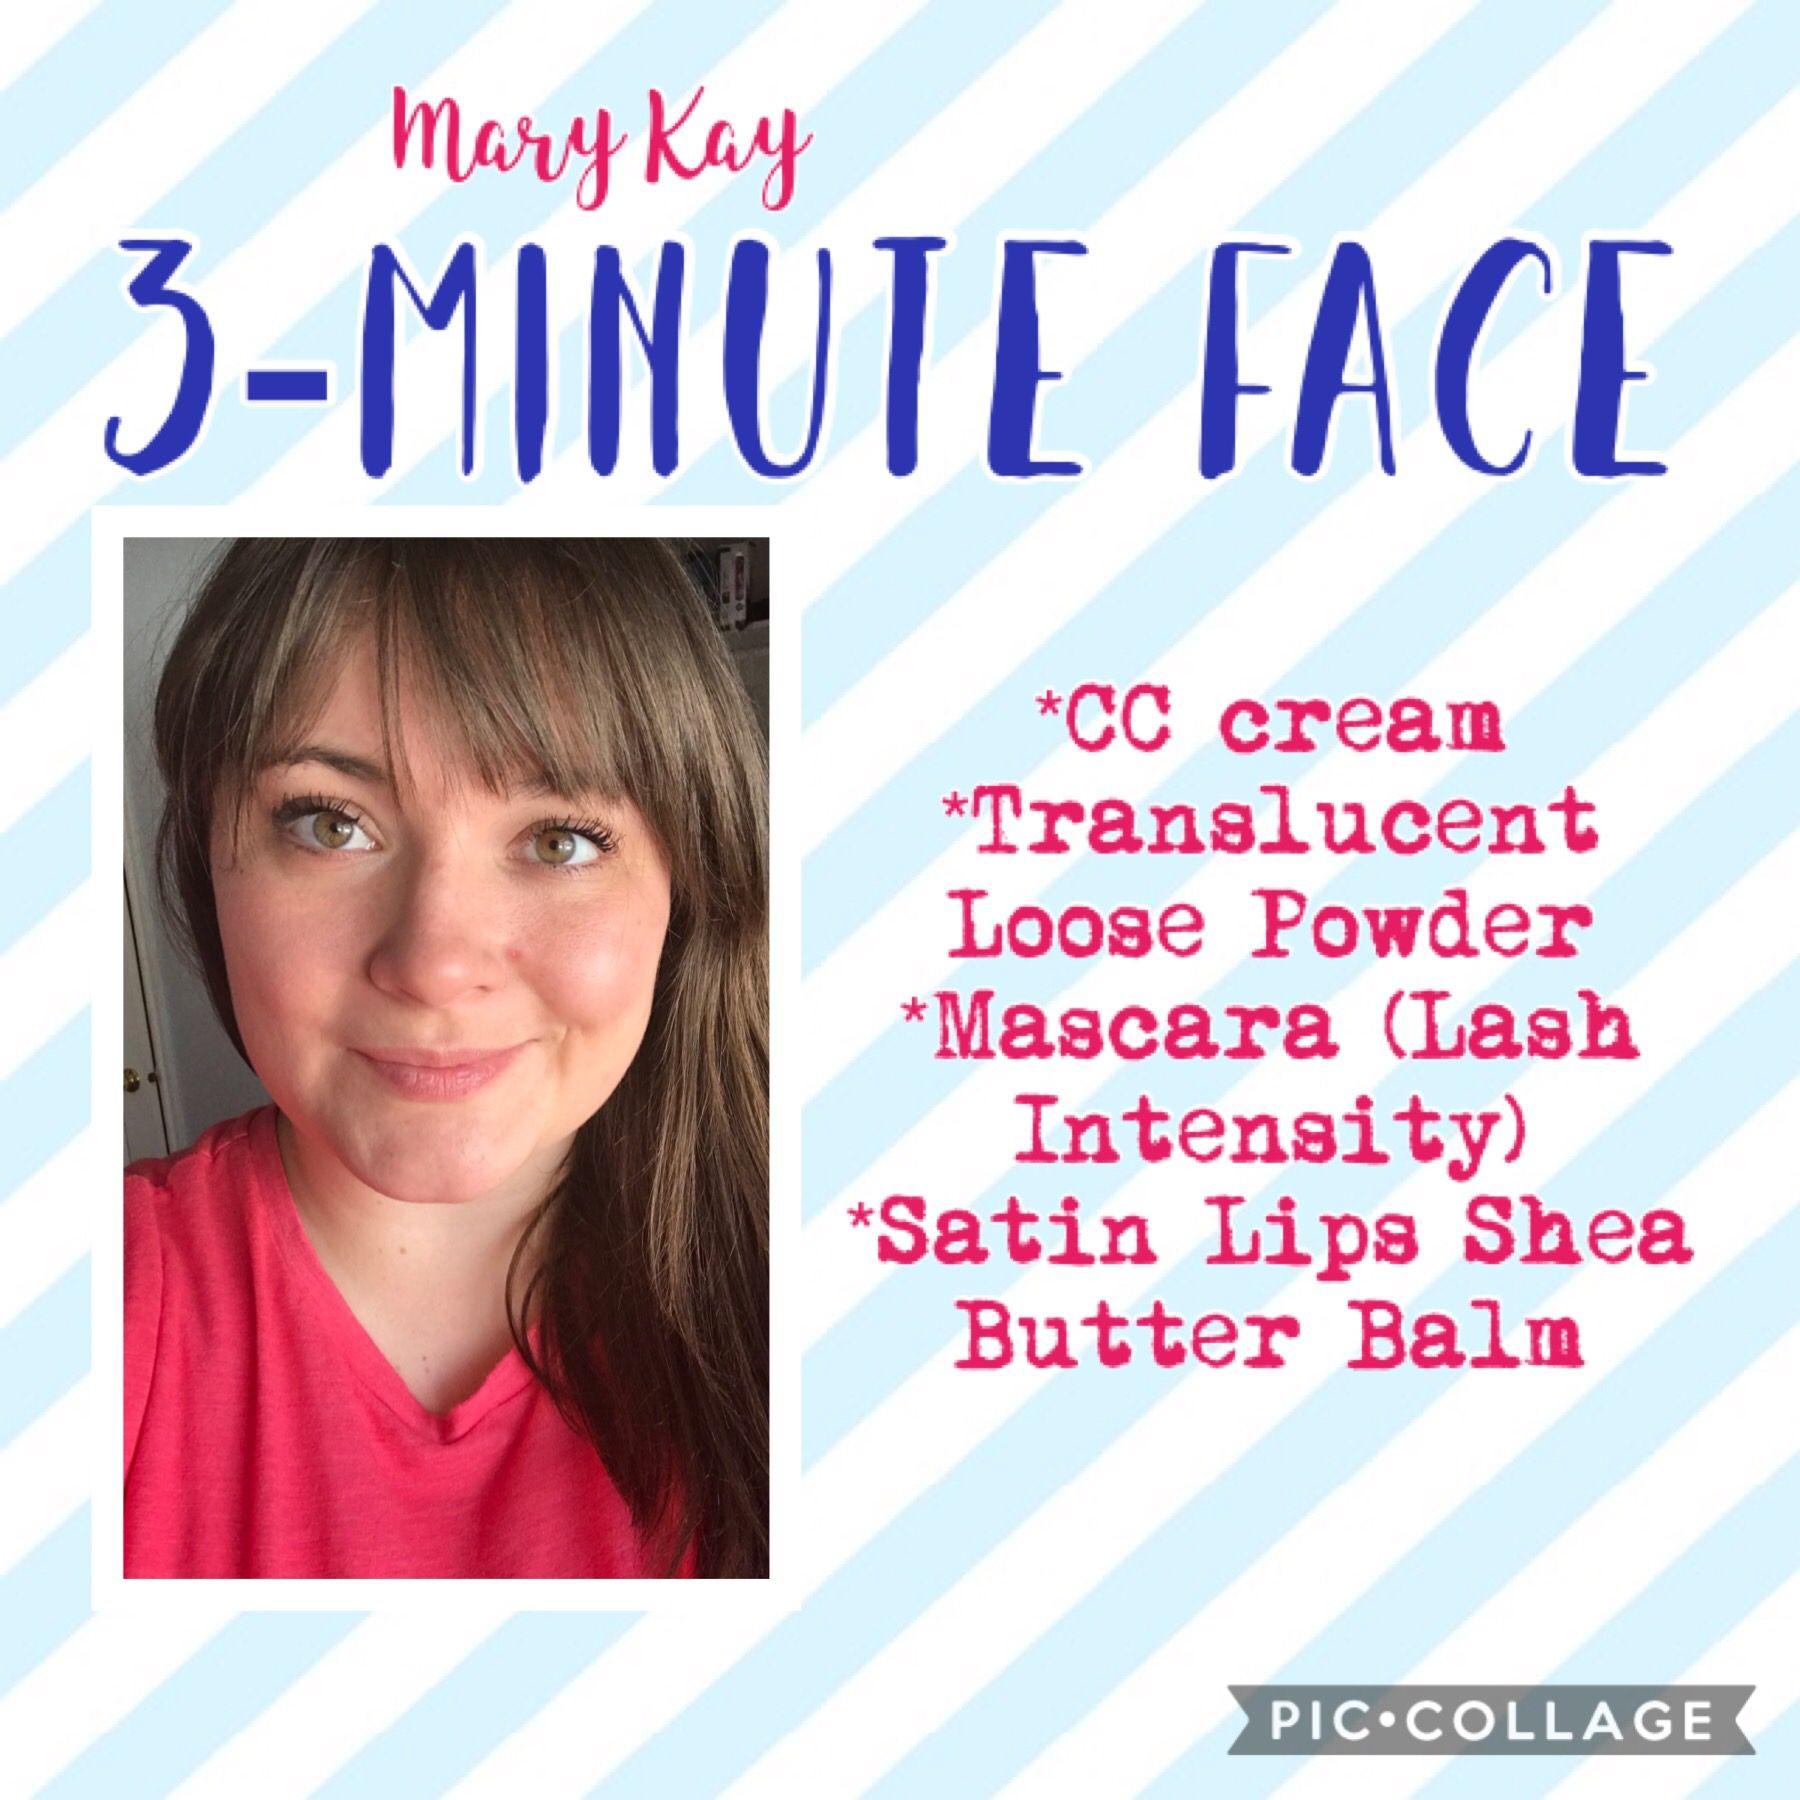 Mary Kay Look Using Cc Cream Translucent Loose Powder